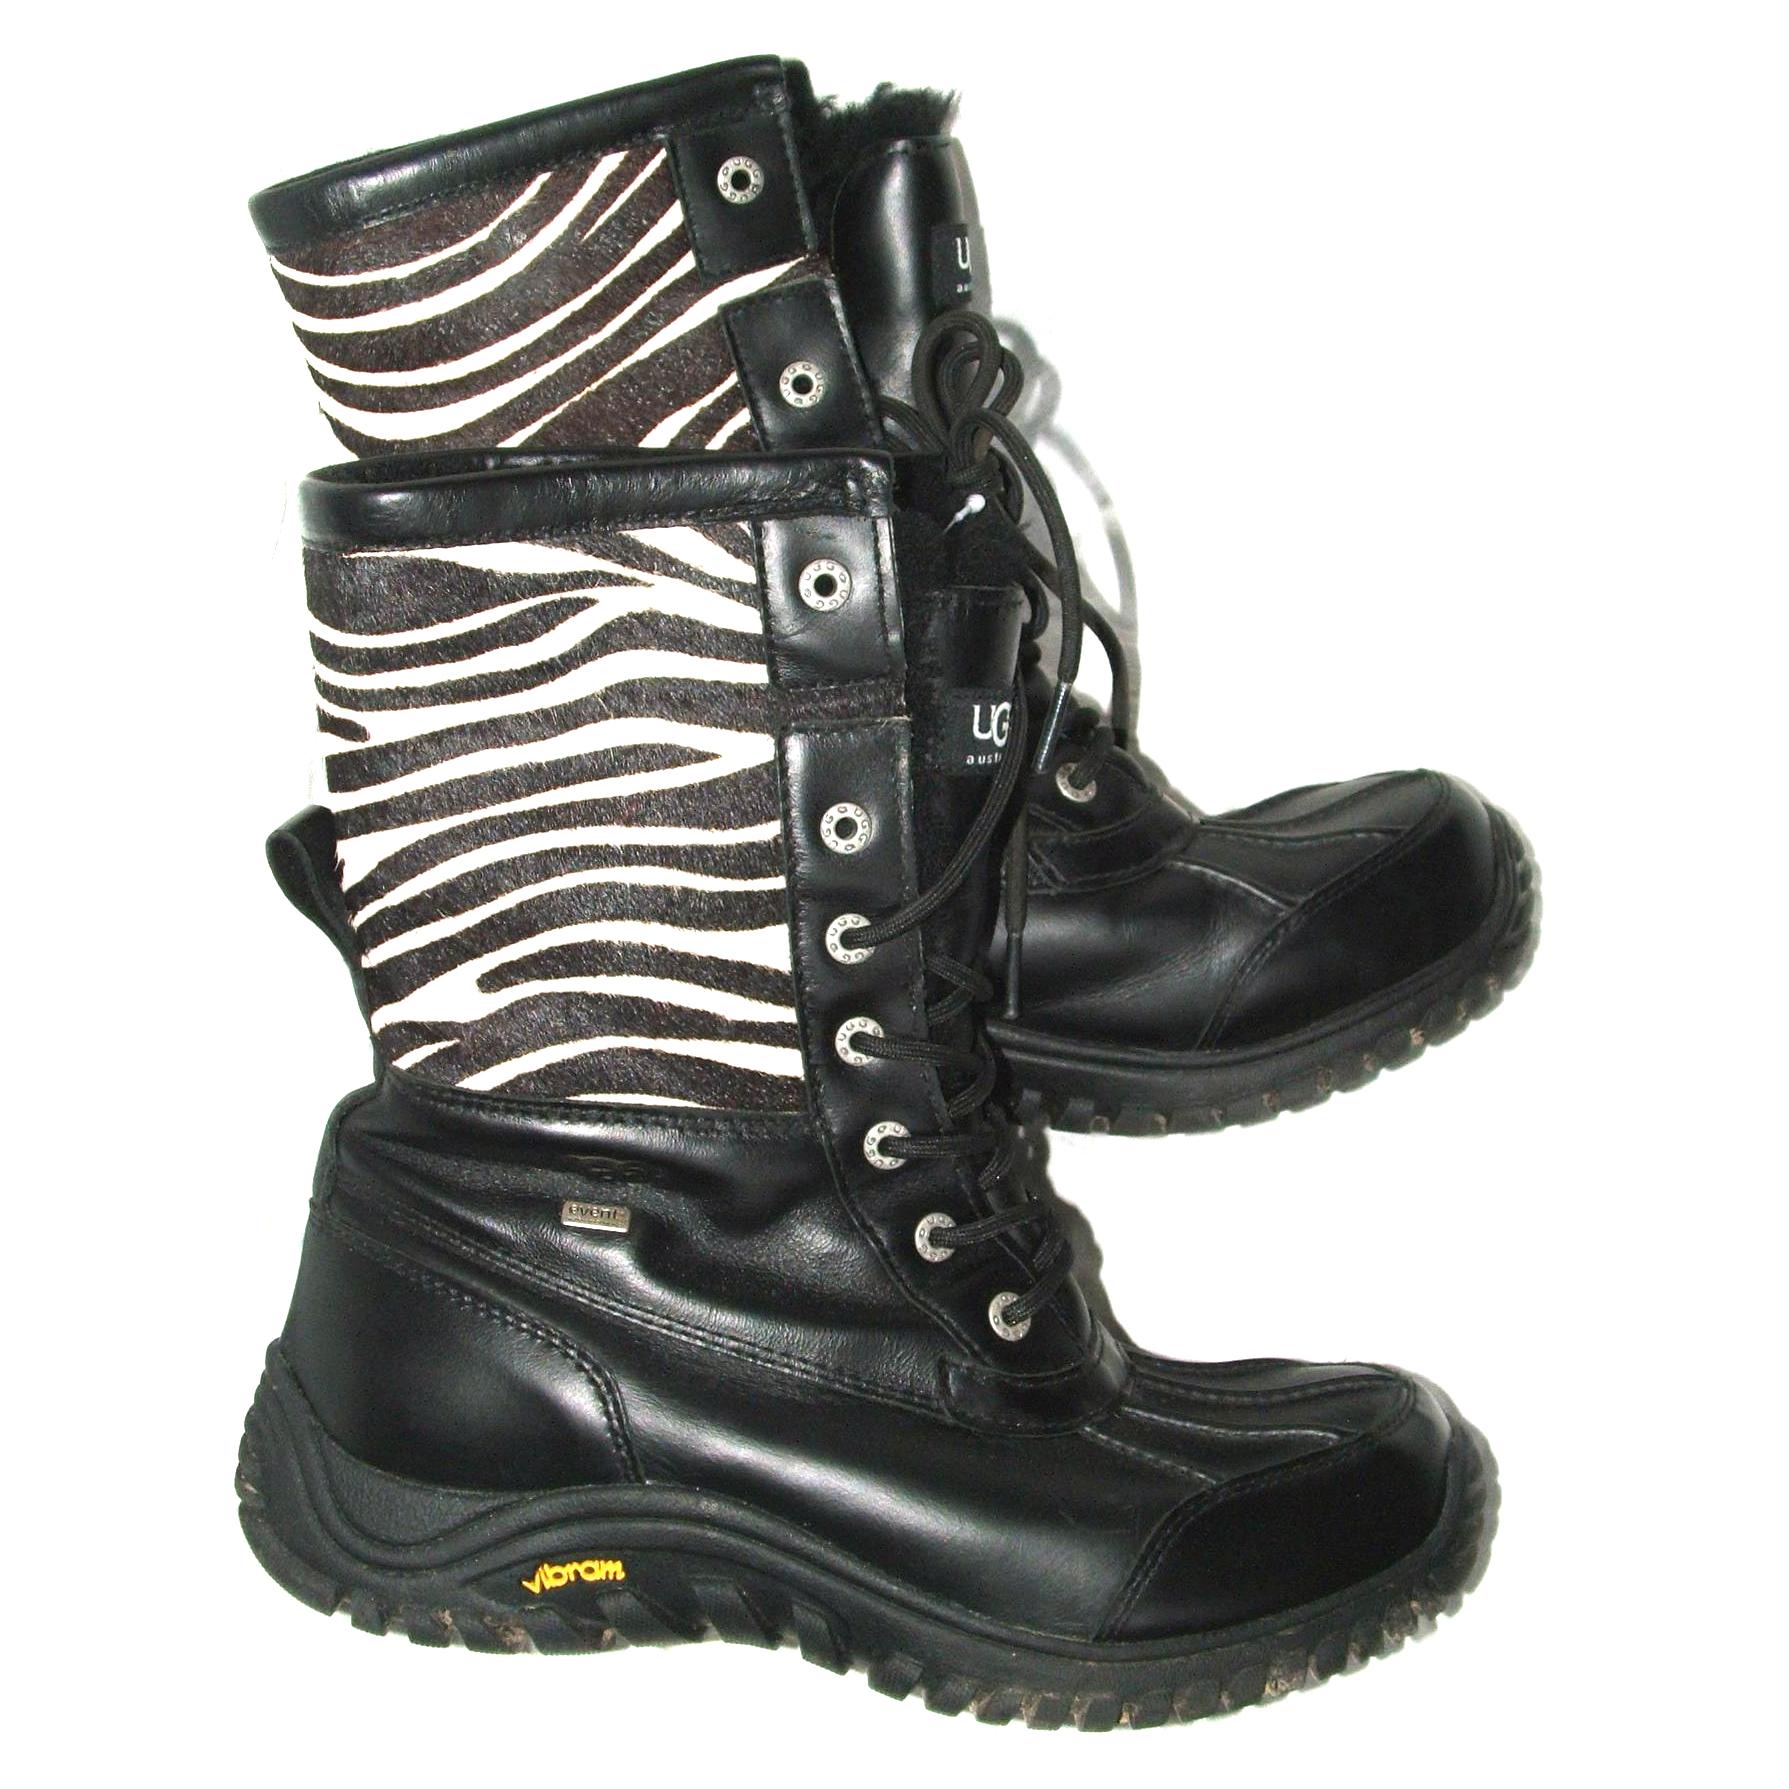 bb7bec2b60a Ugg boots Adirondack tall, U.K. 8.5